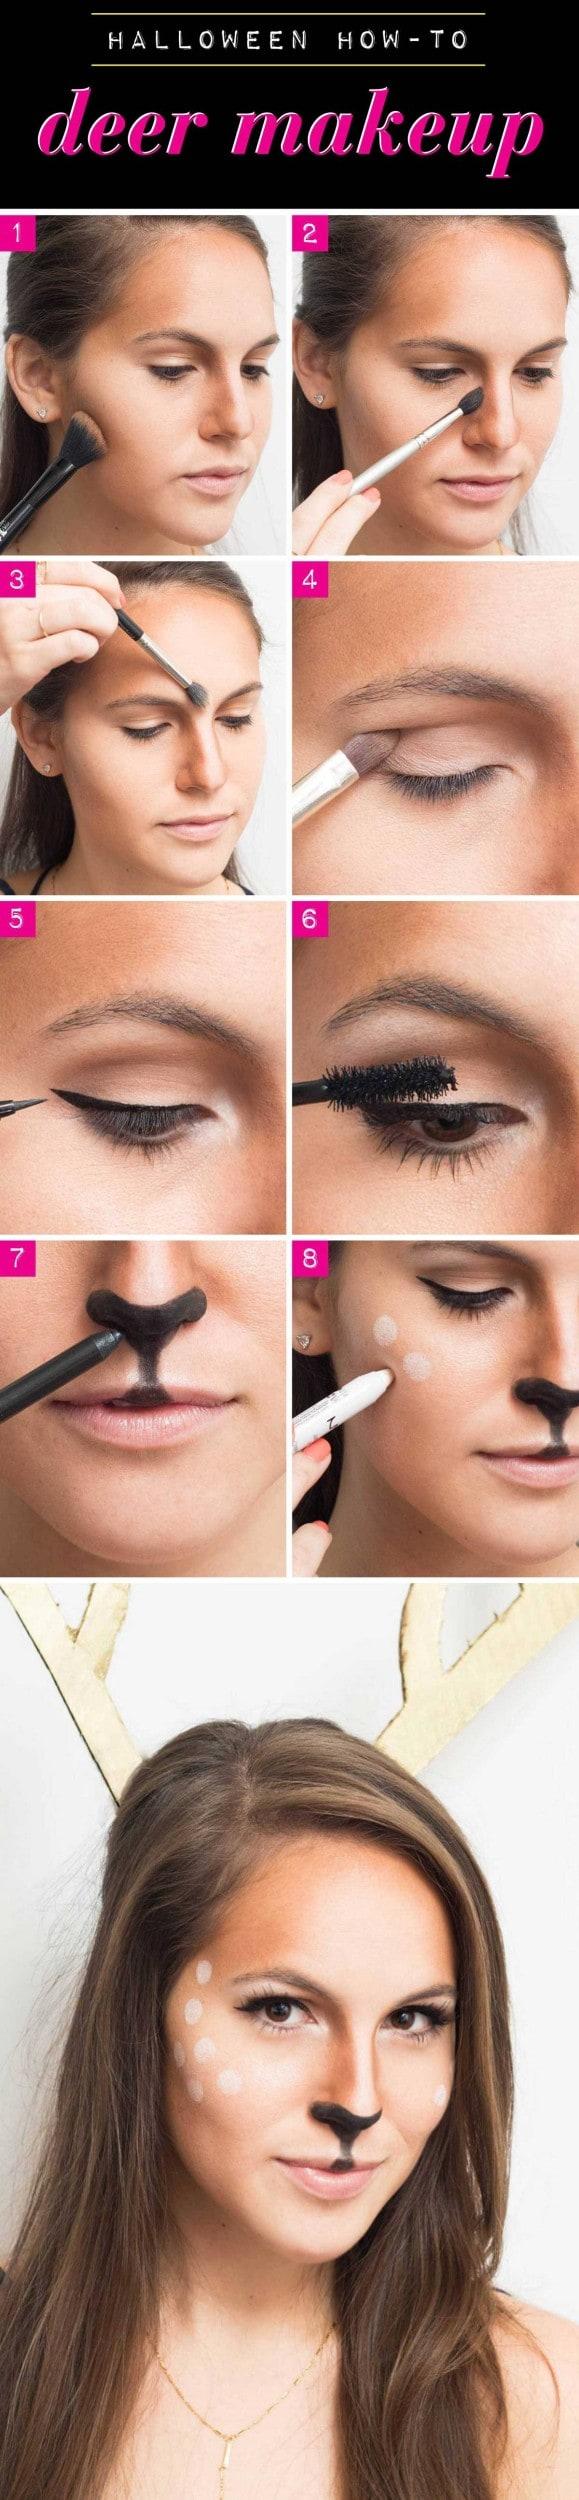 Easy Deer Makeup Tutorial | Saubhaya Makeup